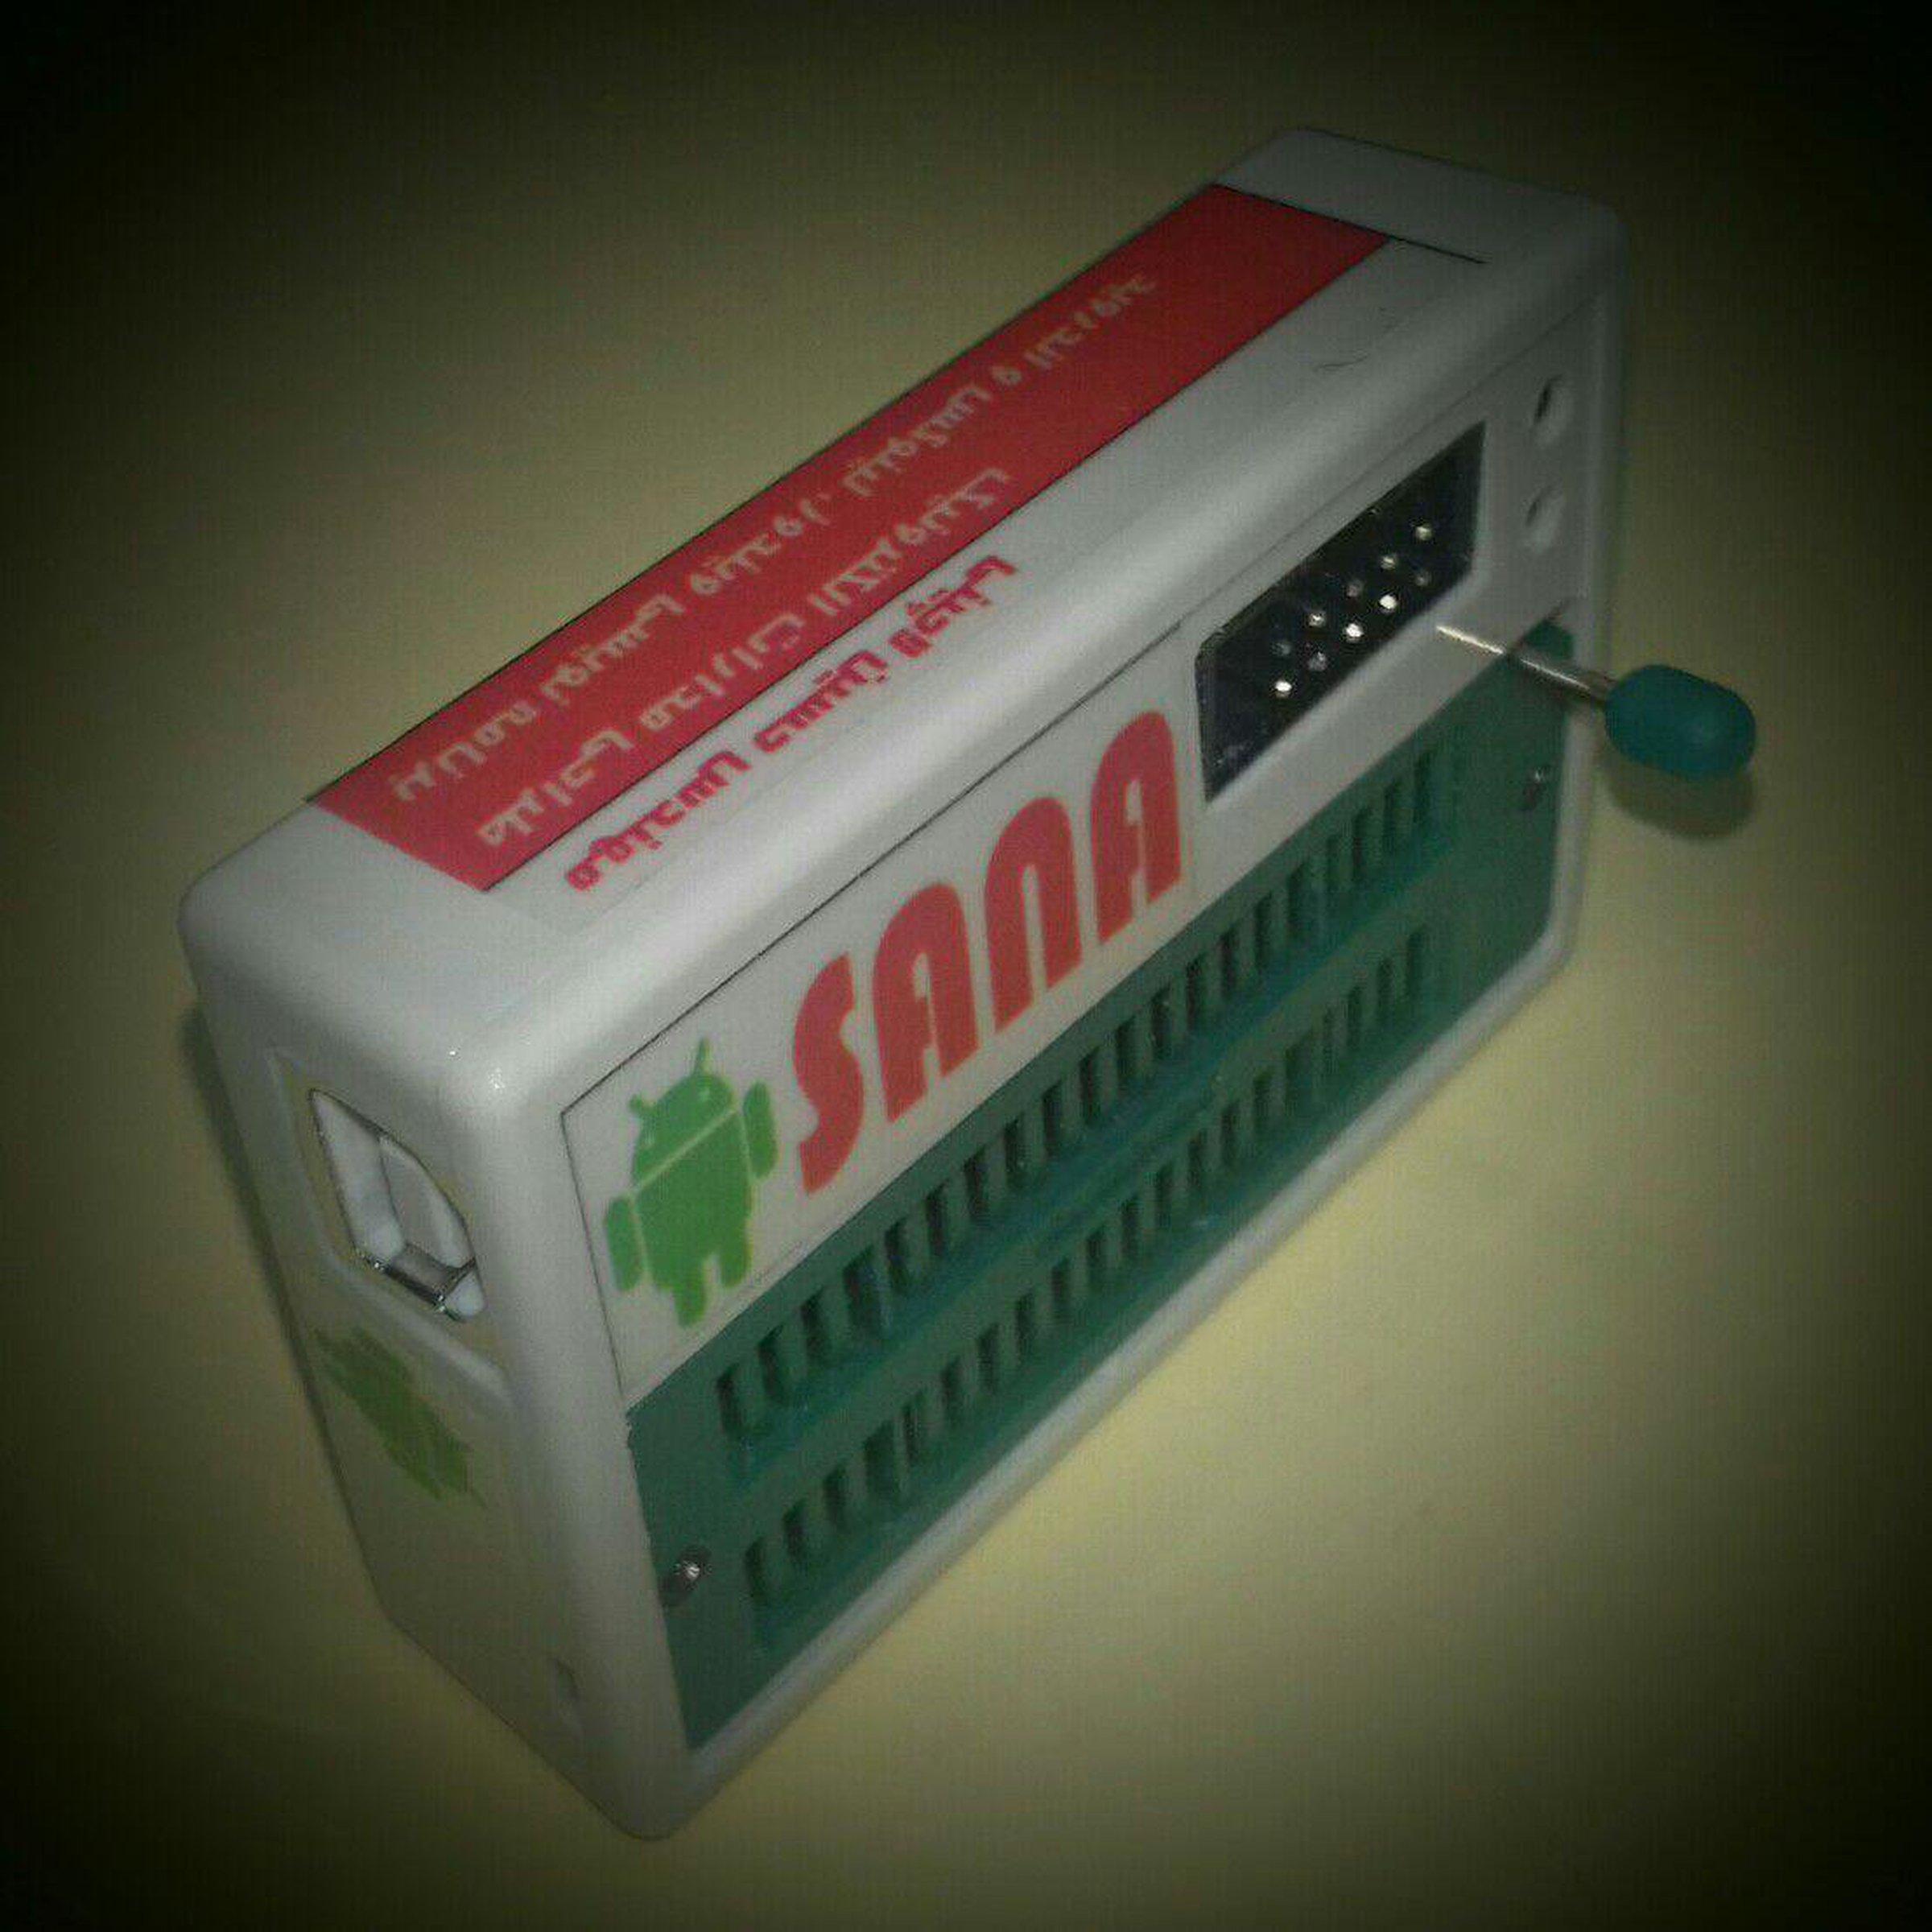 Sana Usbasp Programmer And 89s5x 24cxxx 93cxx From Hossein Atmel Usb Circuit Zif Socket Atmega8 2 4